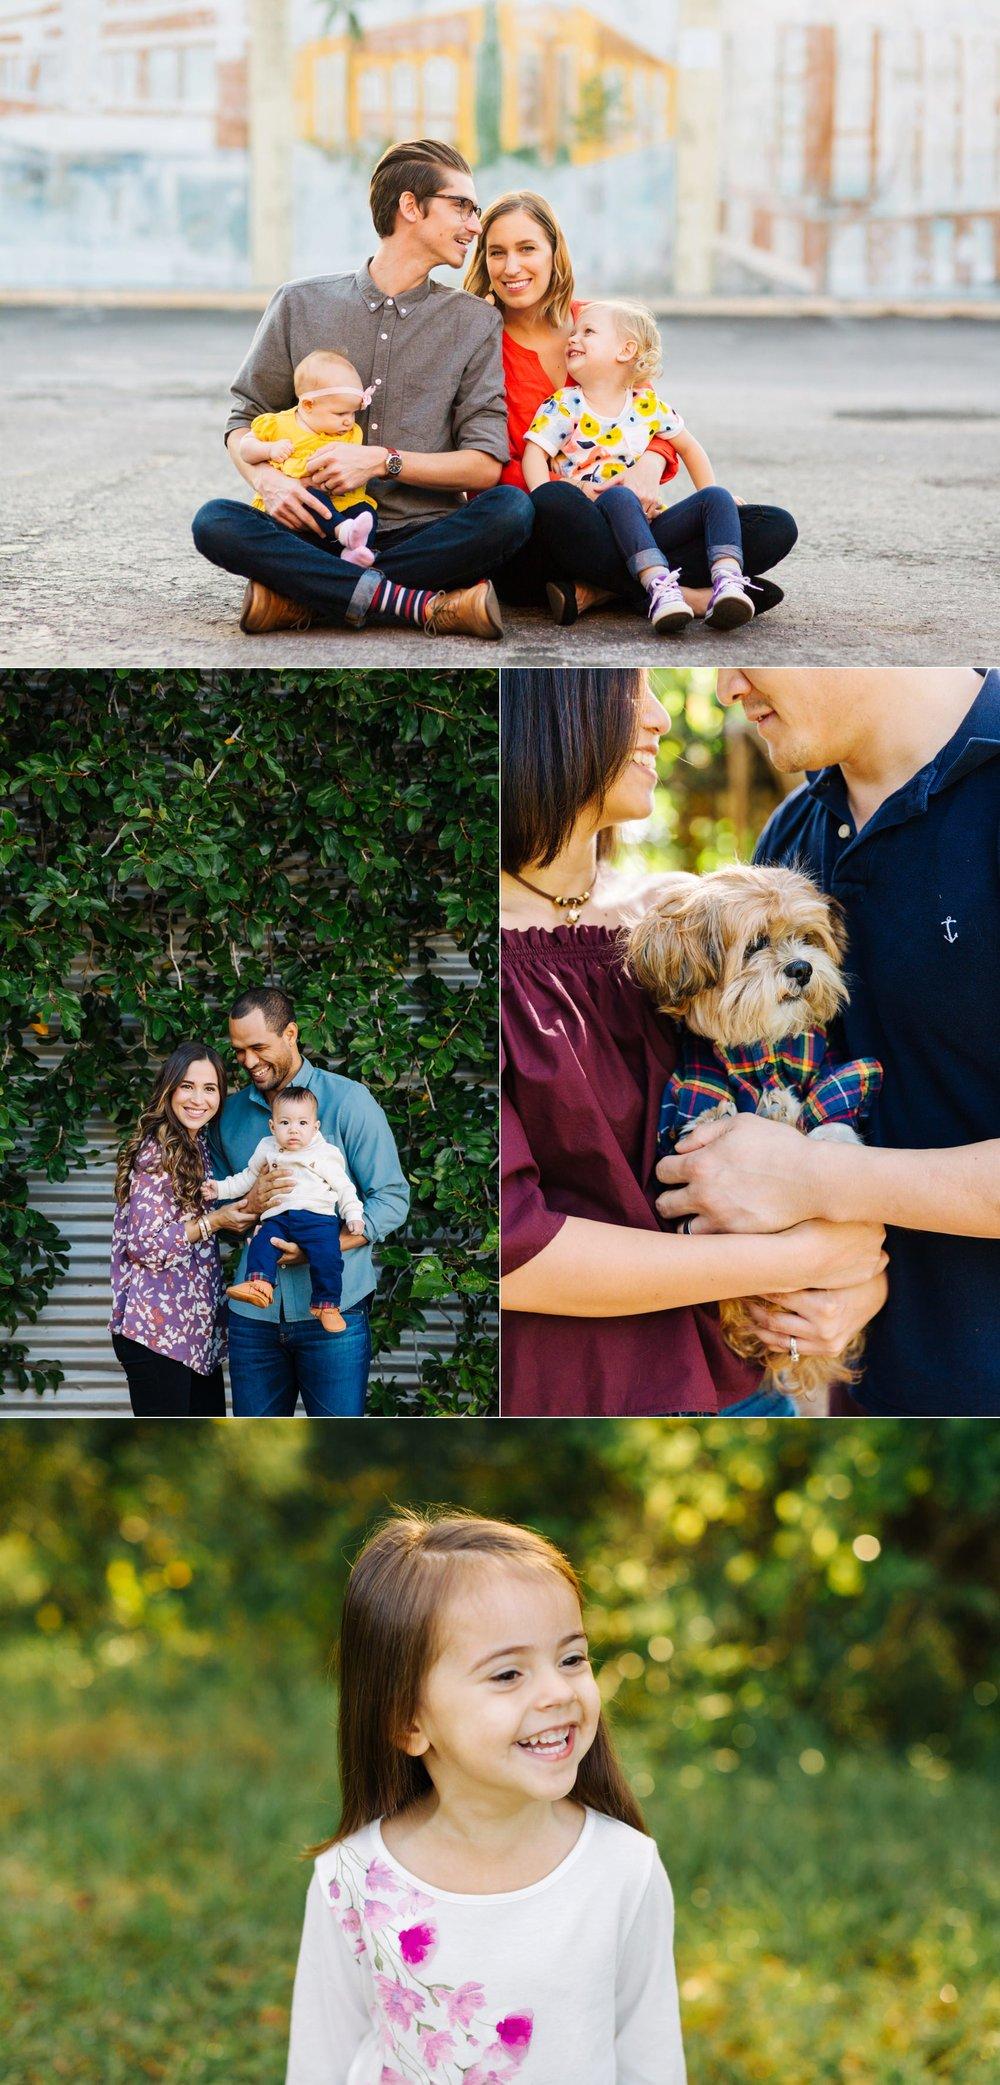 Jake & Katie's Best of Families 2016-026.jpg